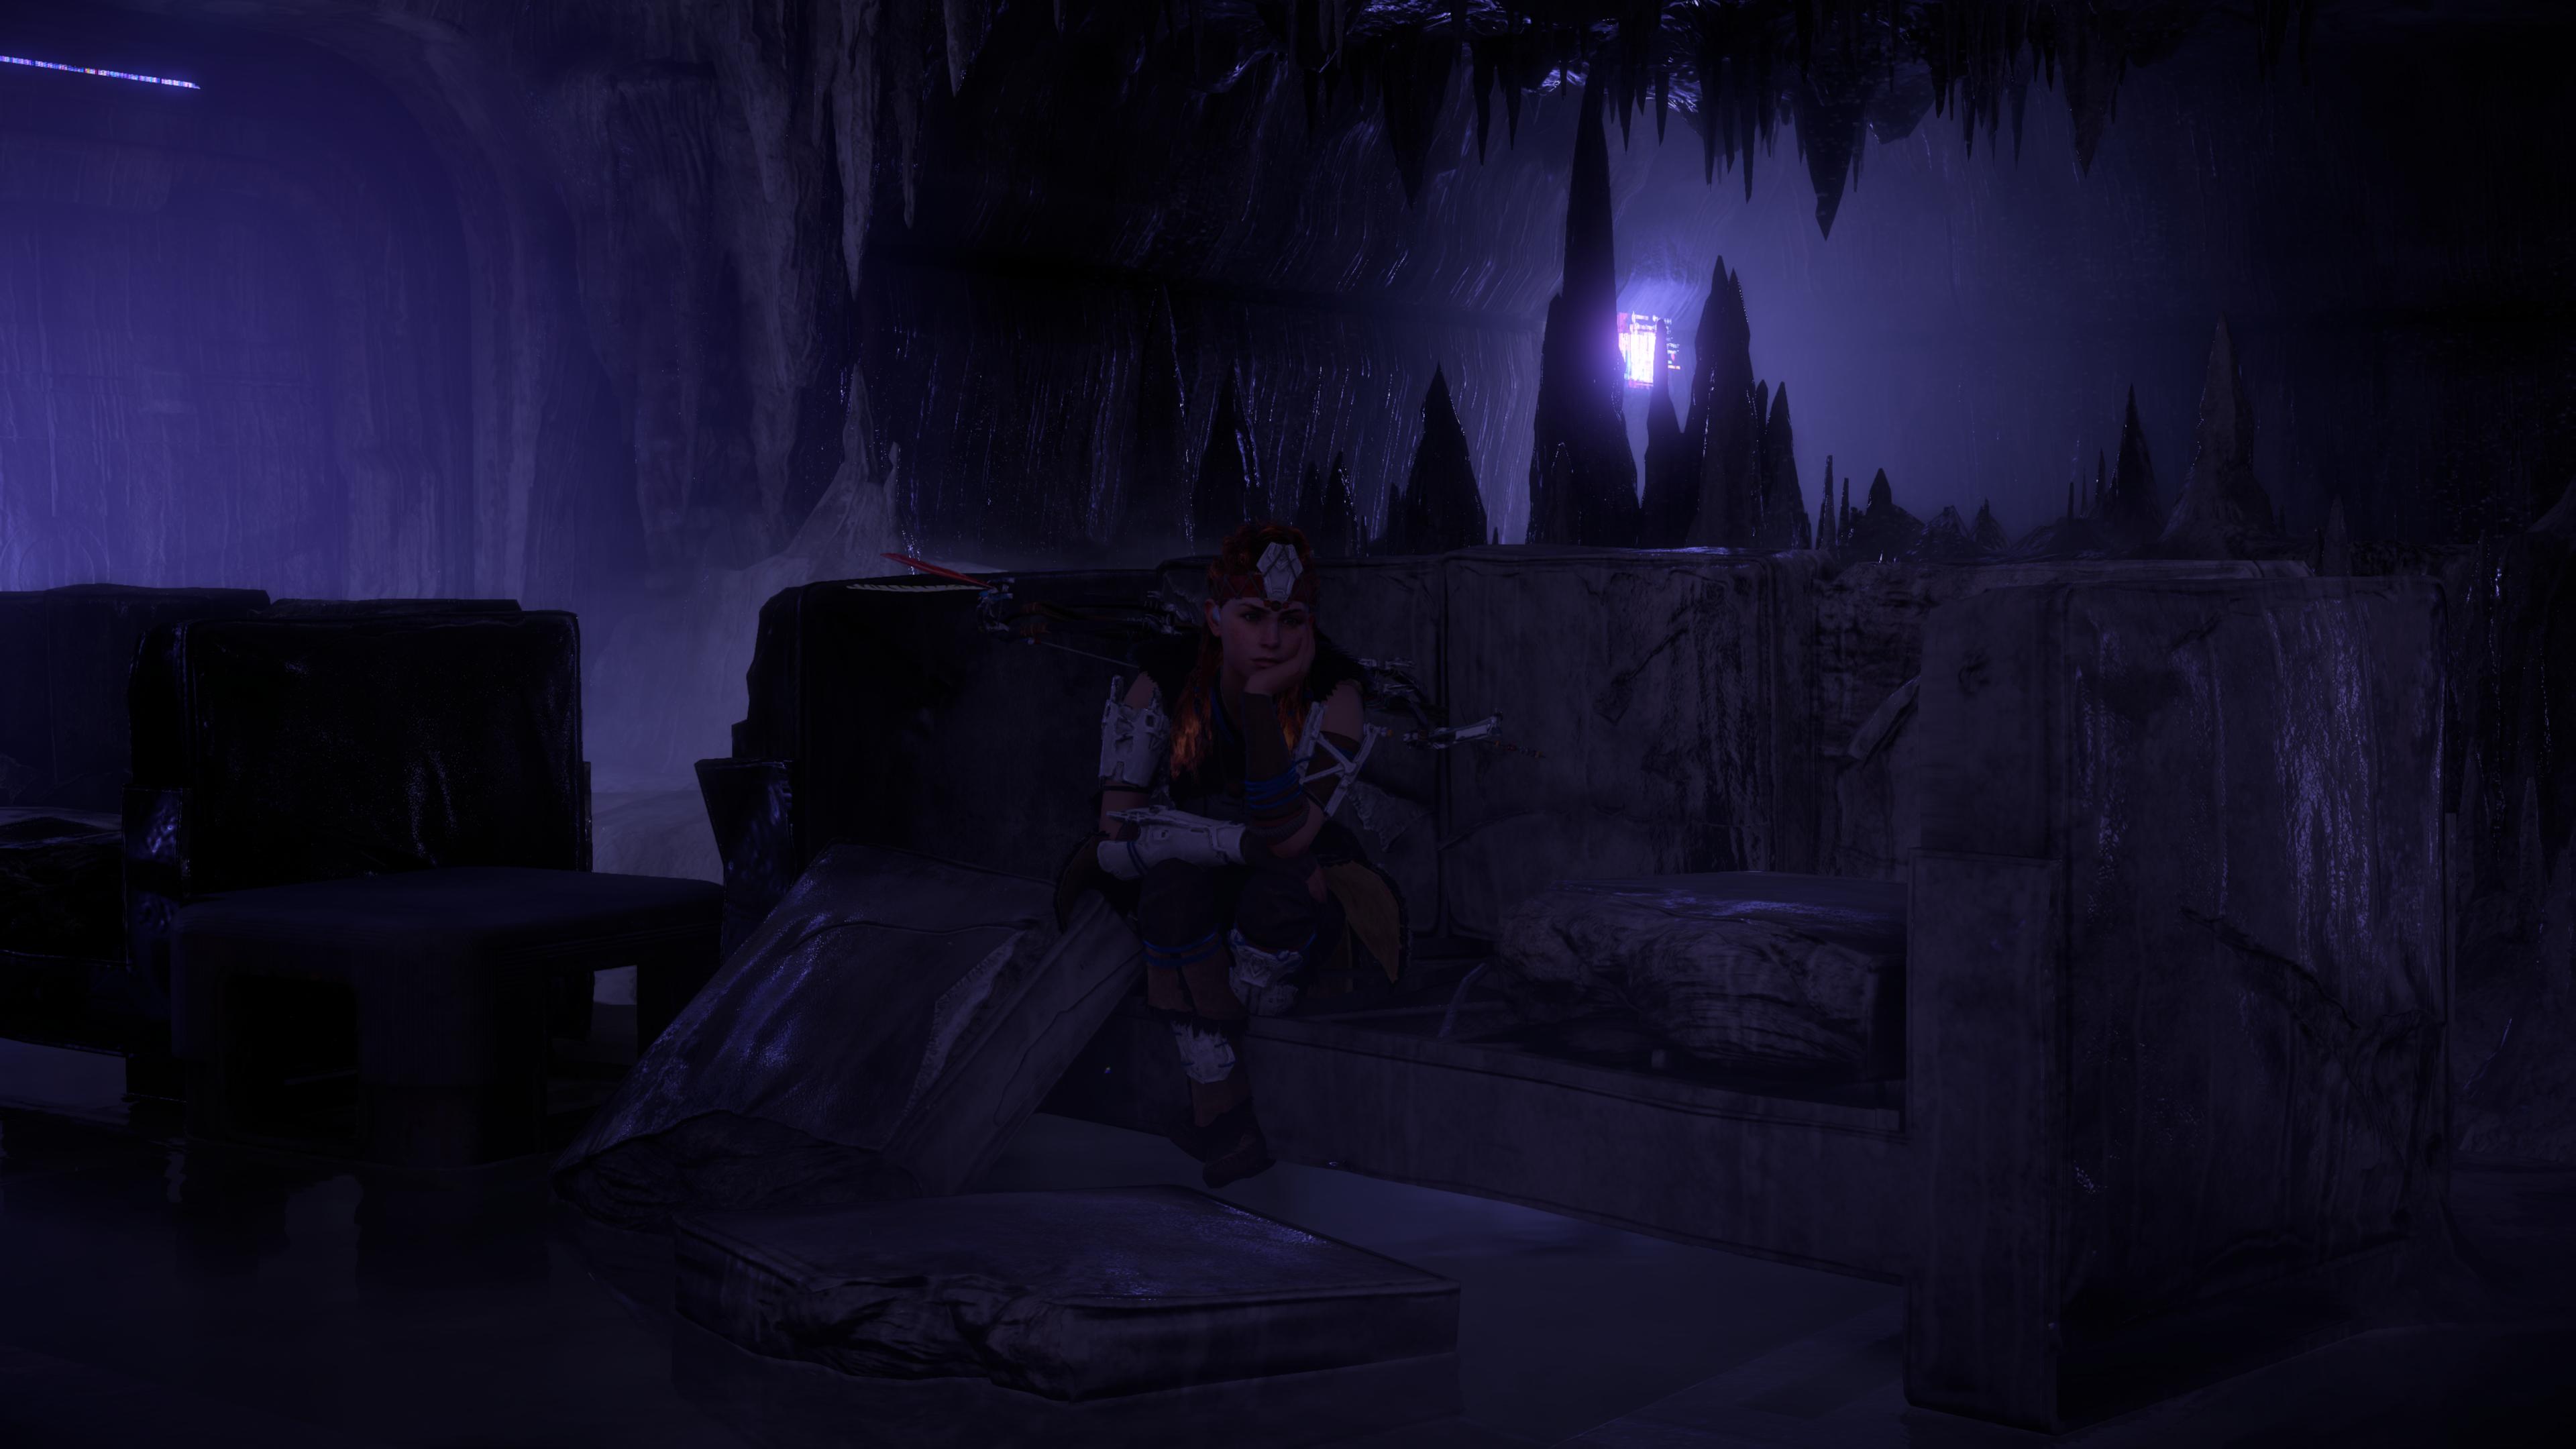 General 3840x2160 horizon zero dawn  Horizon: Zero Dawn Aloy (Horizon: Zero Dawn) sitting cave vault bunker coach dark 4K video games video game characters